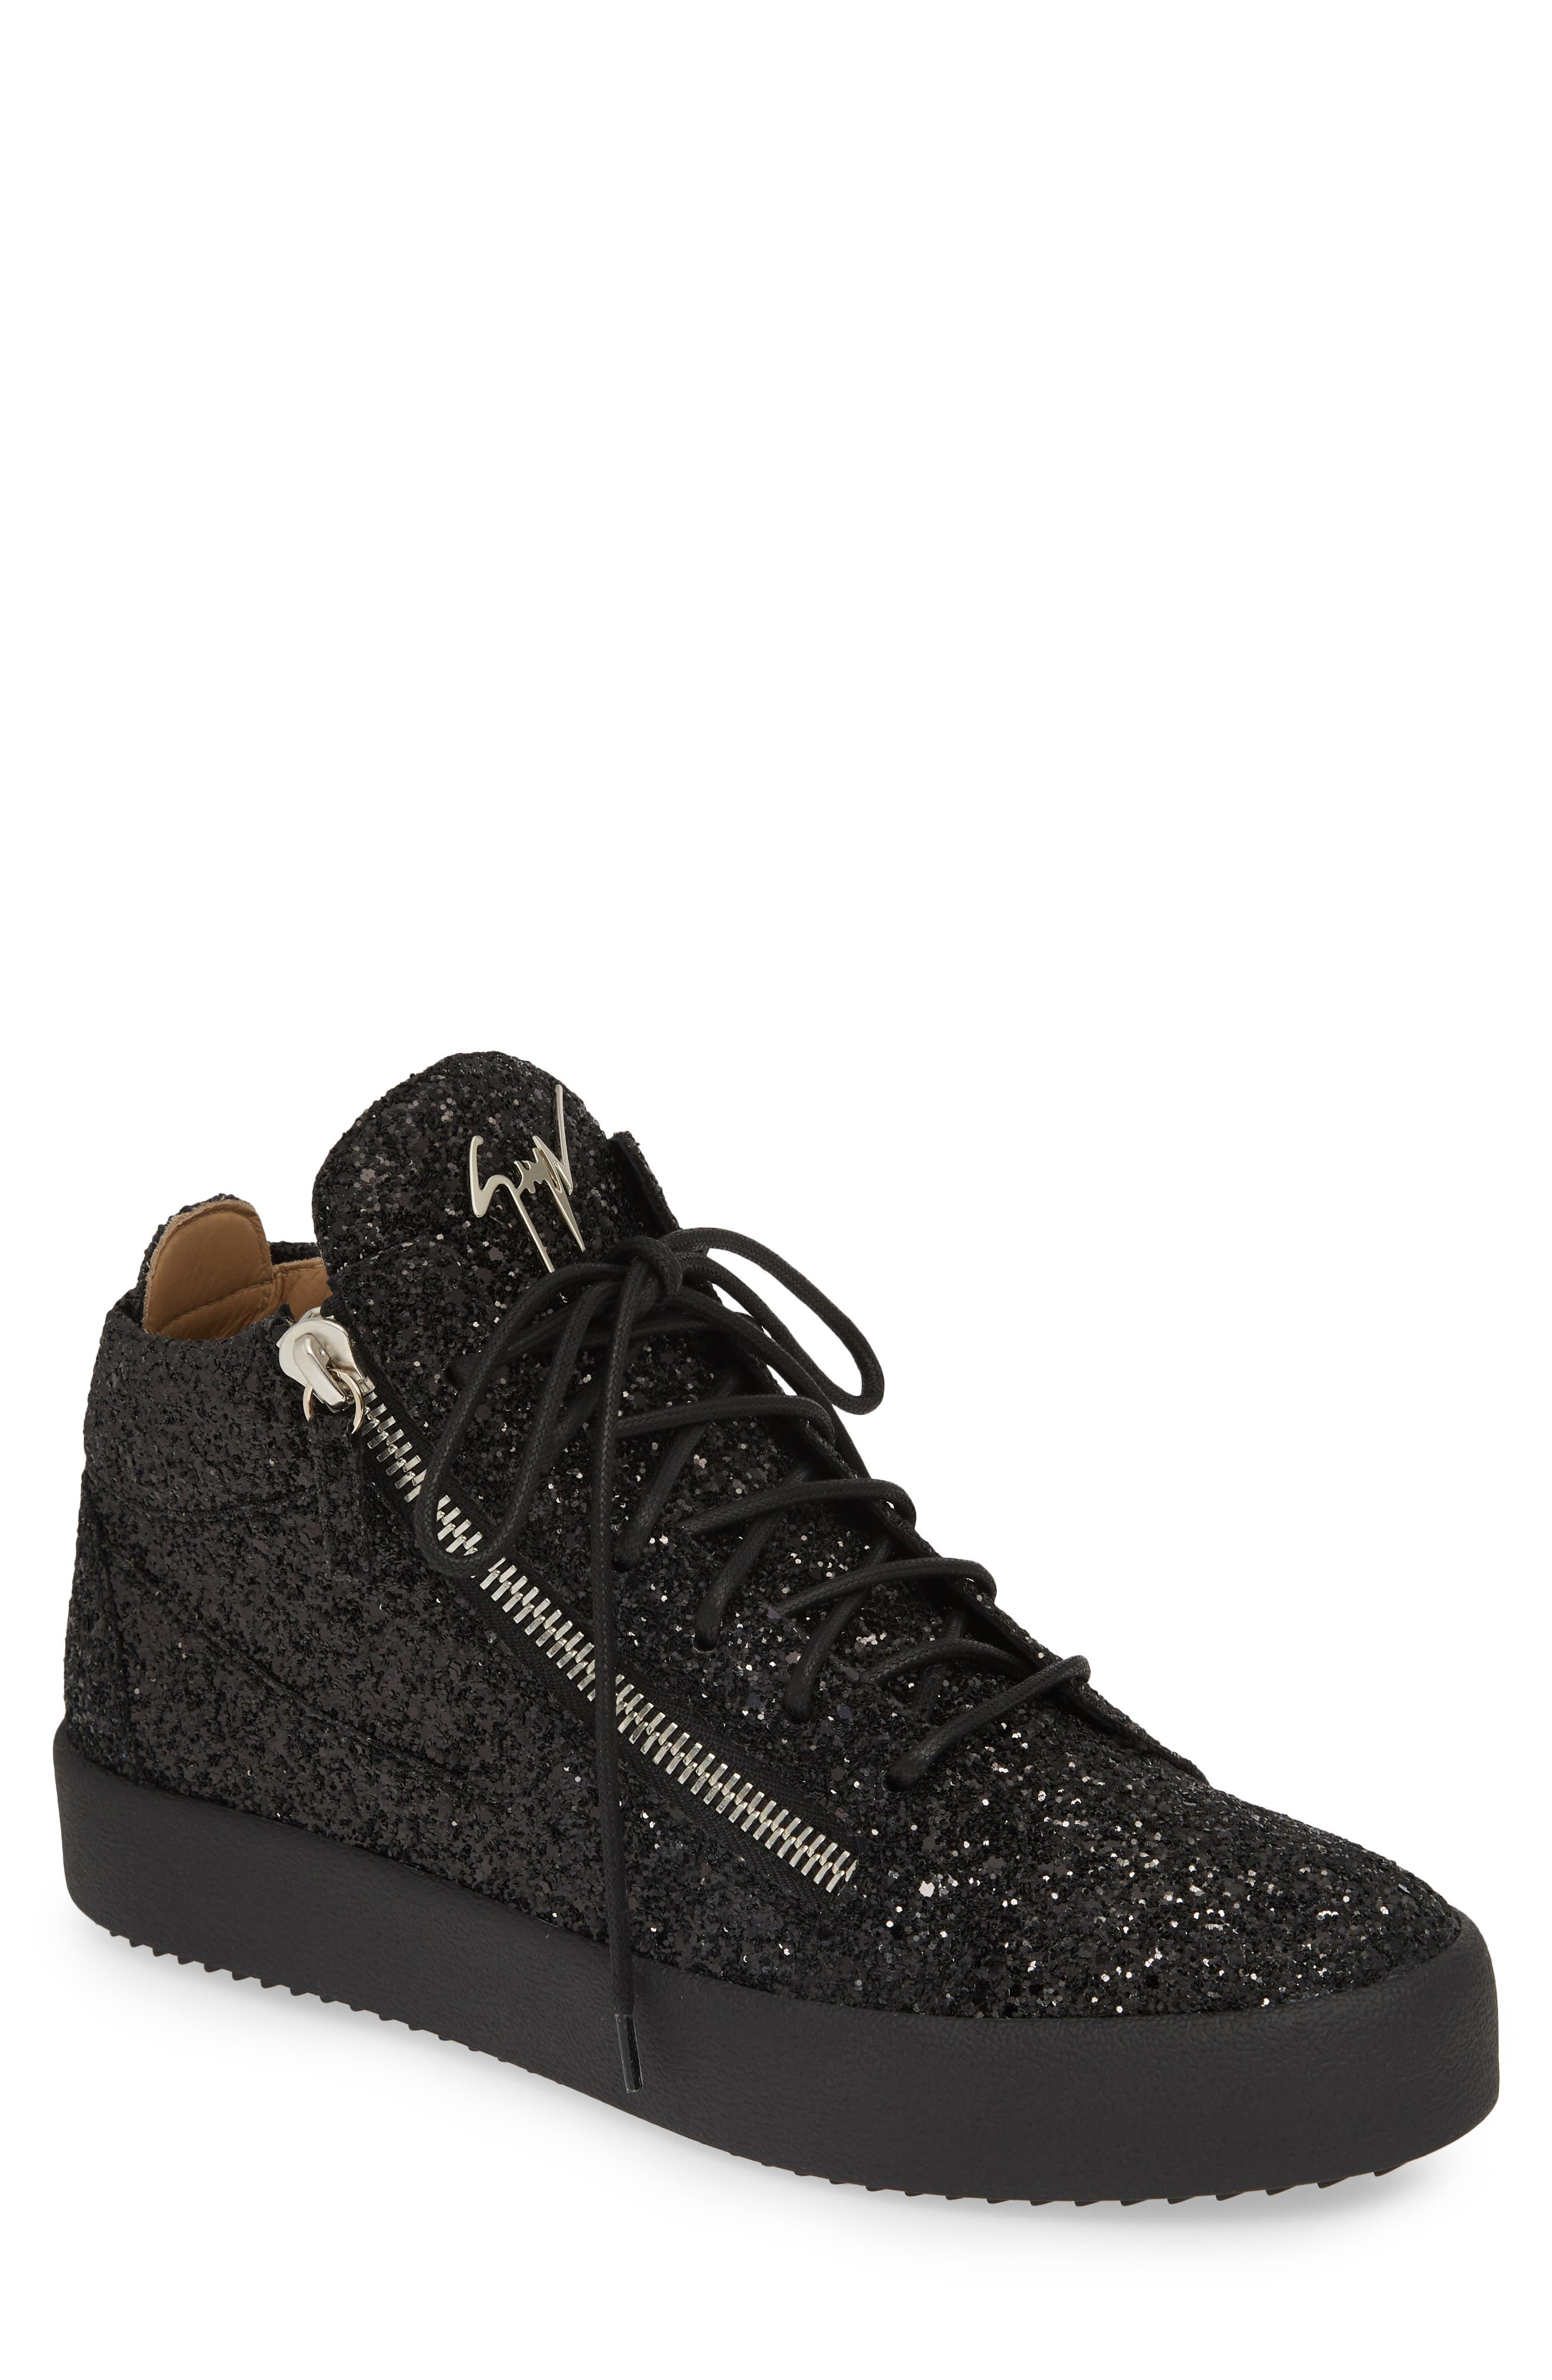 Men's Giuseppe Zanotti View All: Clothing, Shoes